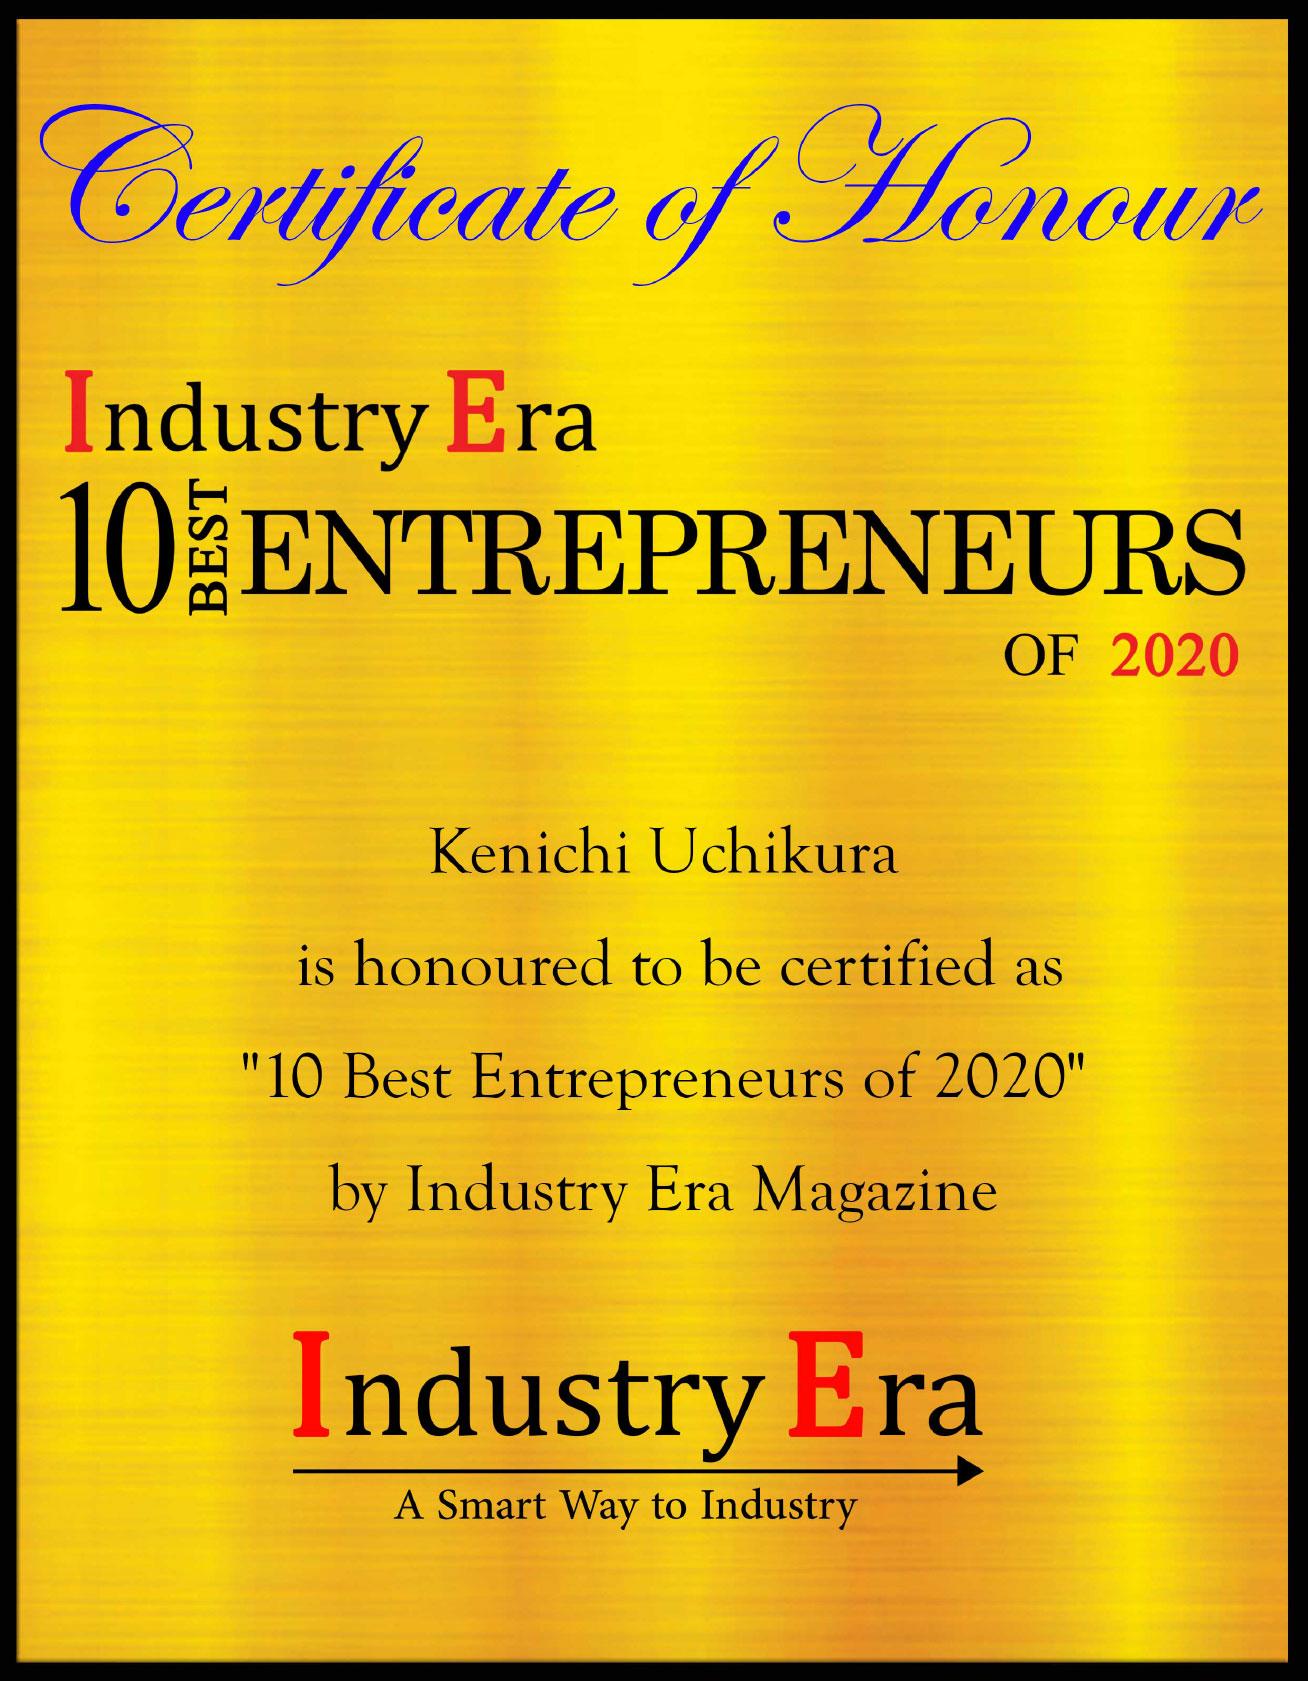 Kenichi Uchikura - Top 10 Entrepreneur of 2020